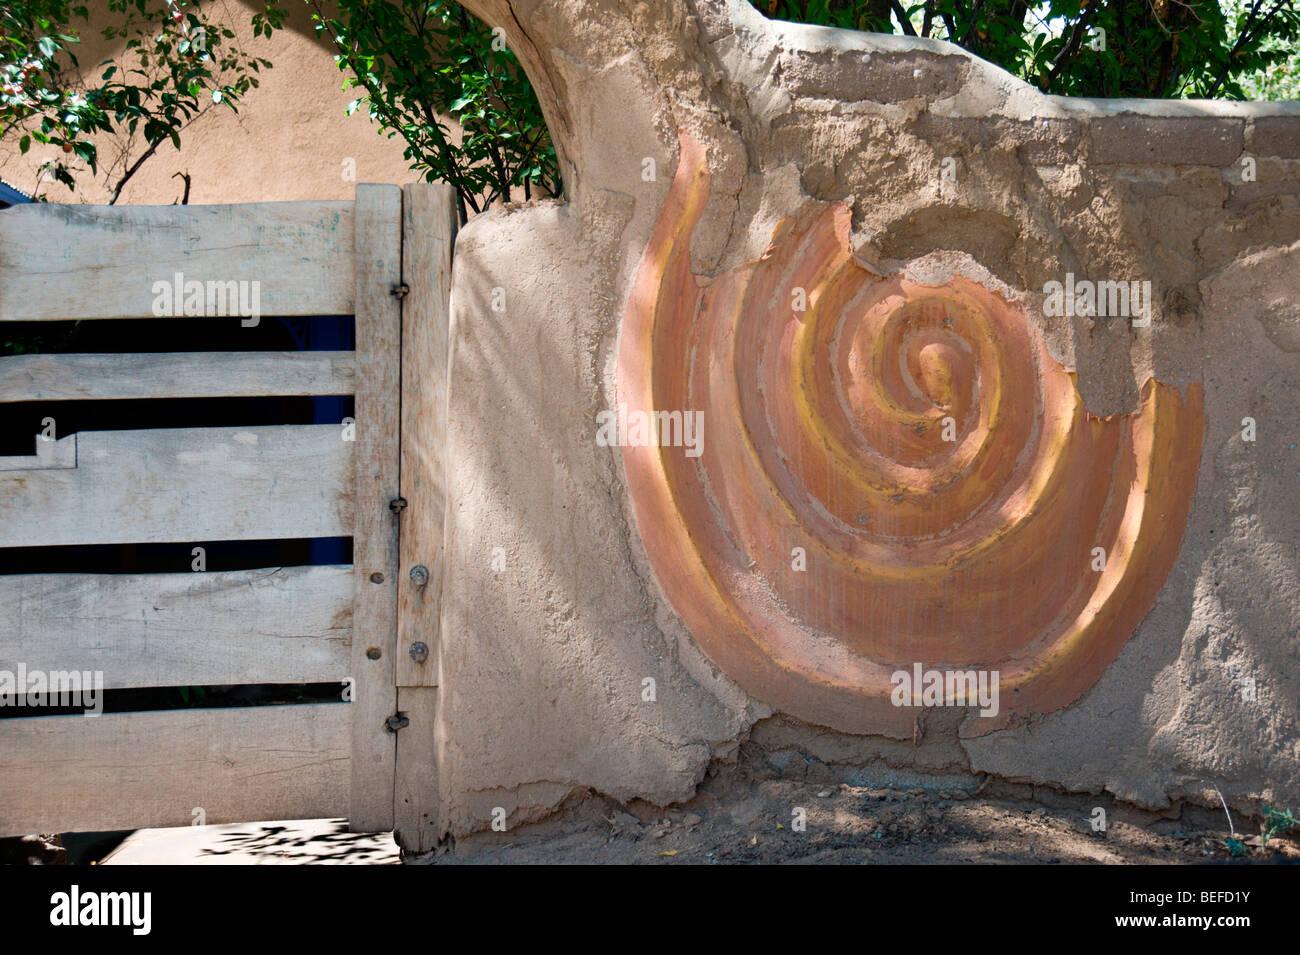 Garden Accents Stock Photos & Garden Accents Stock Images - Alamy